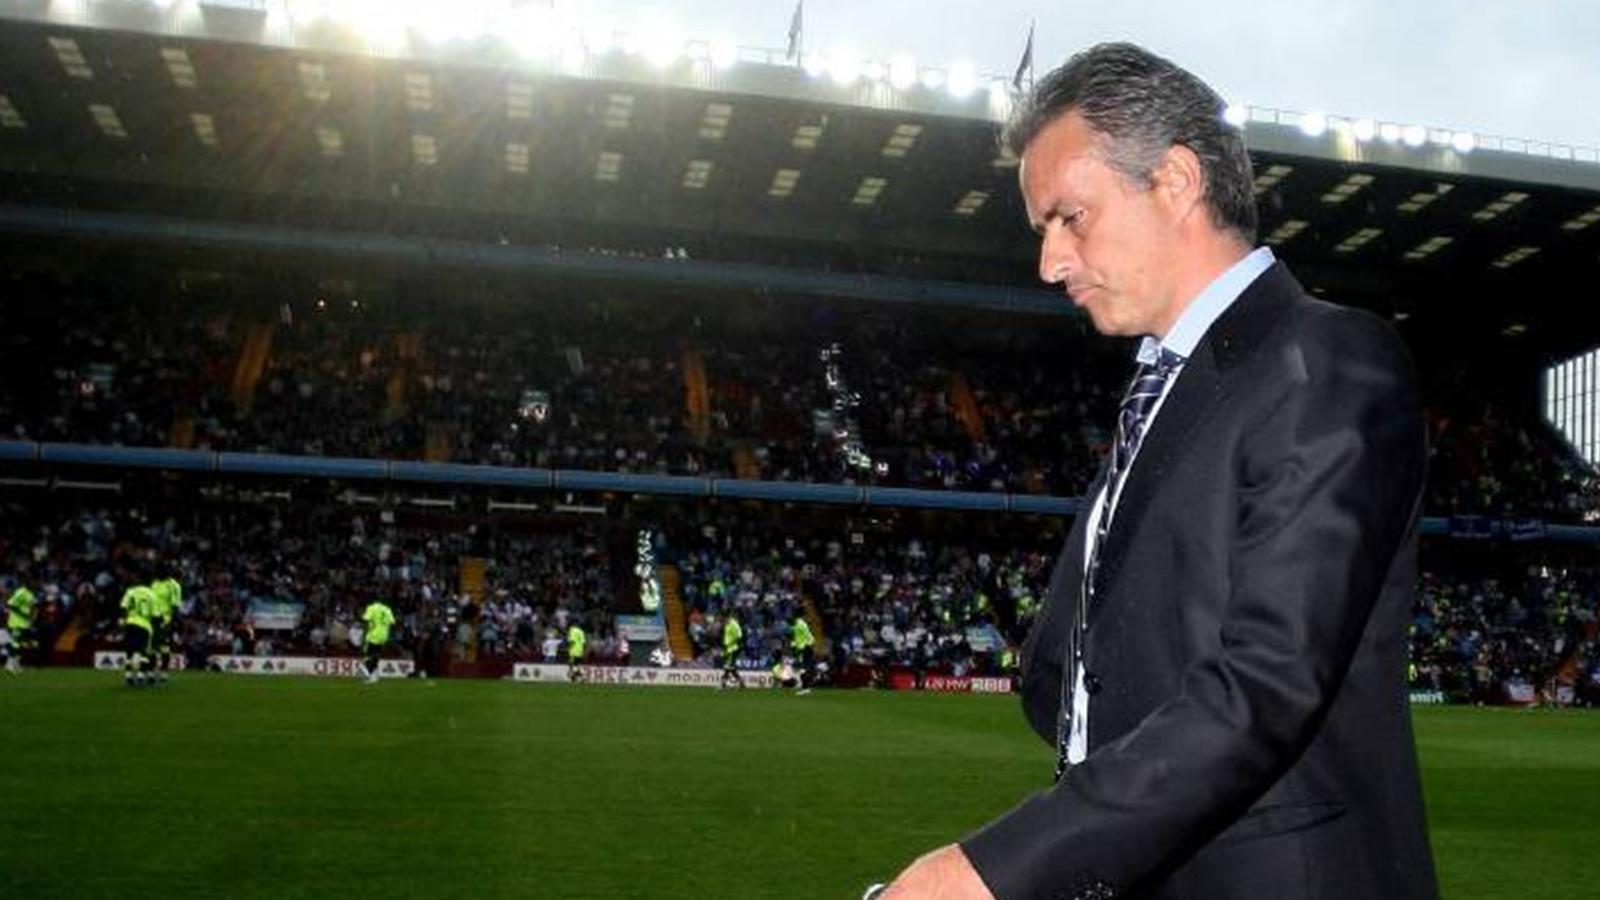 Mourinho agrees pay off premier league 2007 2008 - University league tables french ...